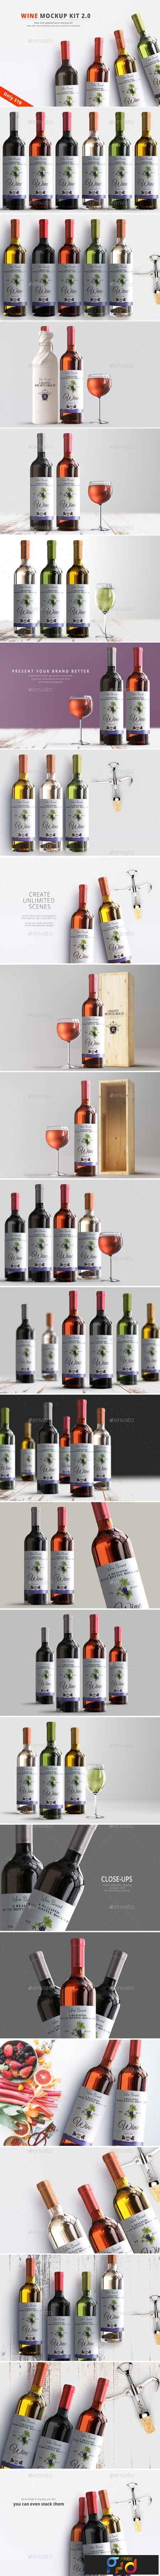 Wine Mockup Kit 2.0 22732337 1